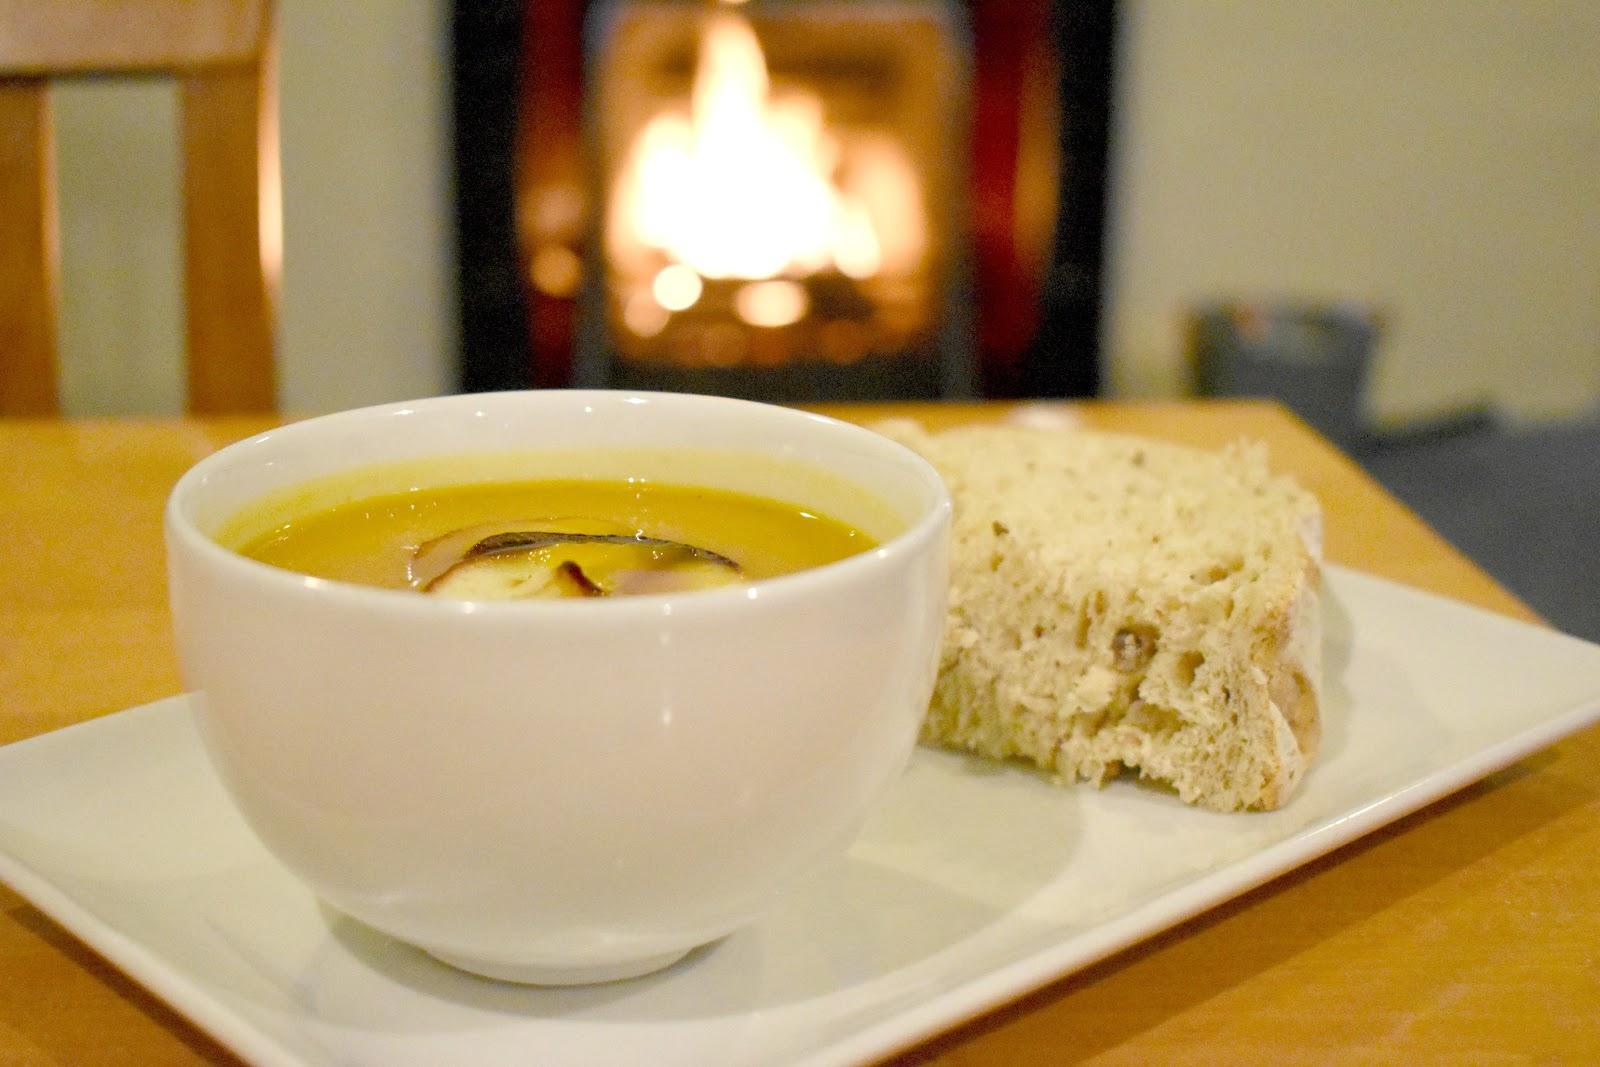 Christmas at Cragside - Festive Lunch